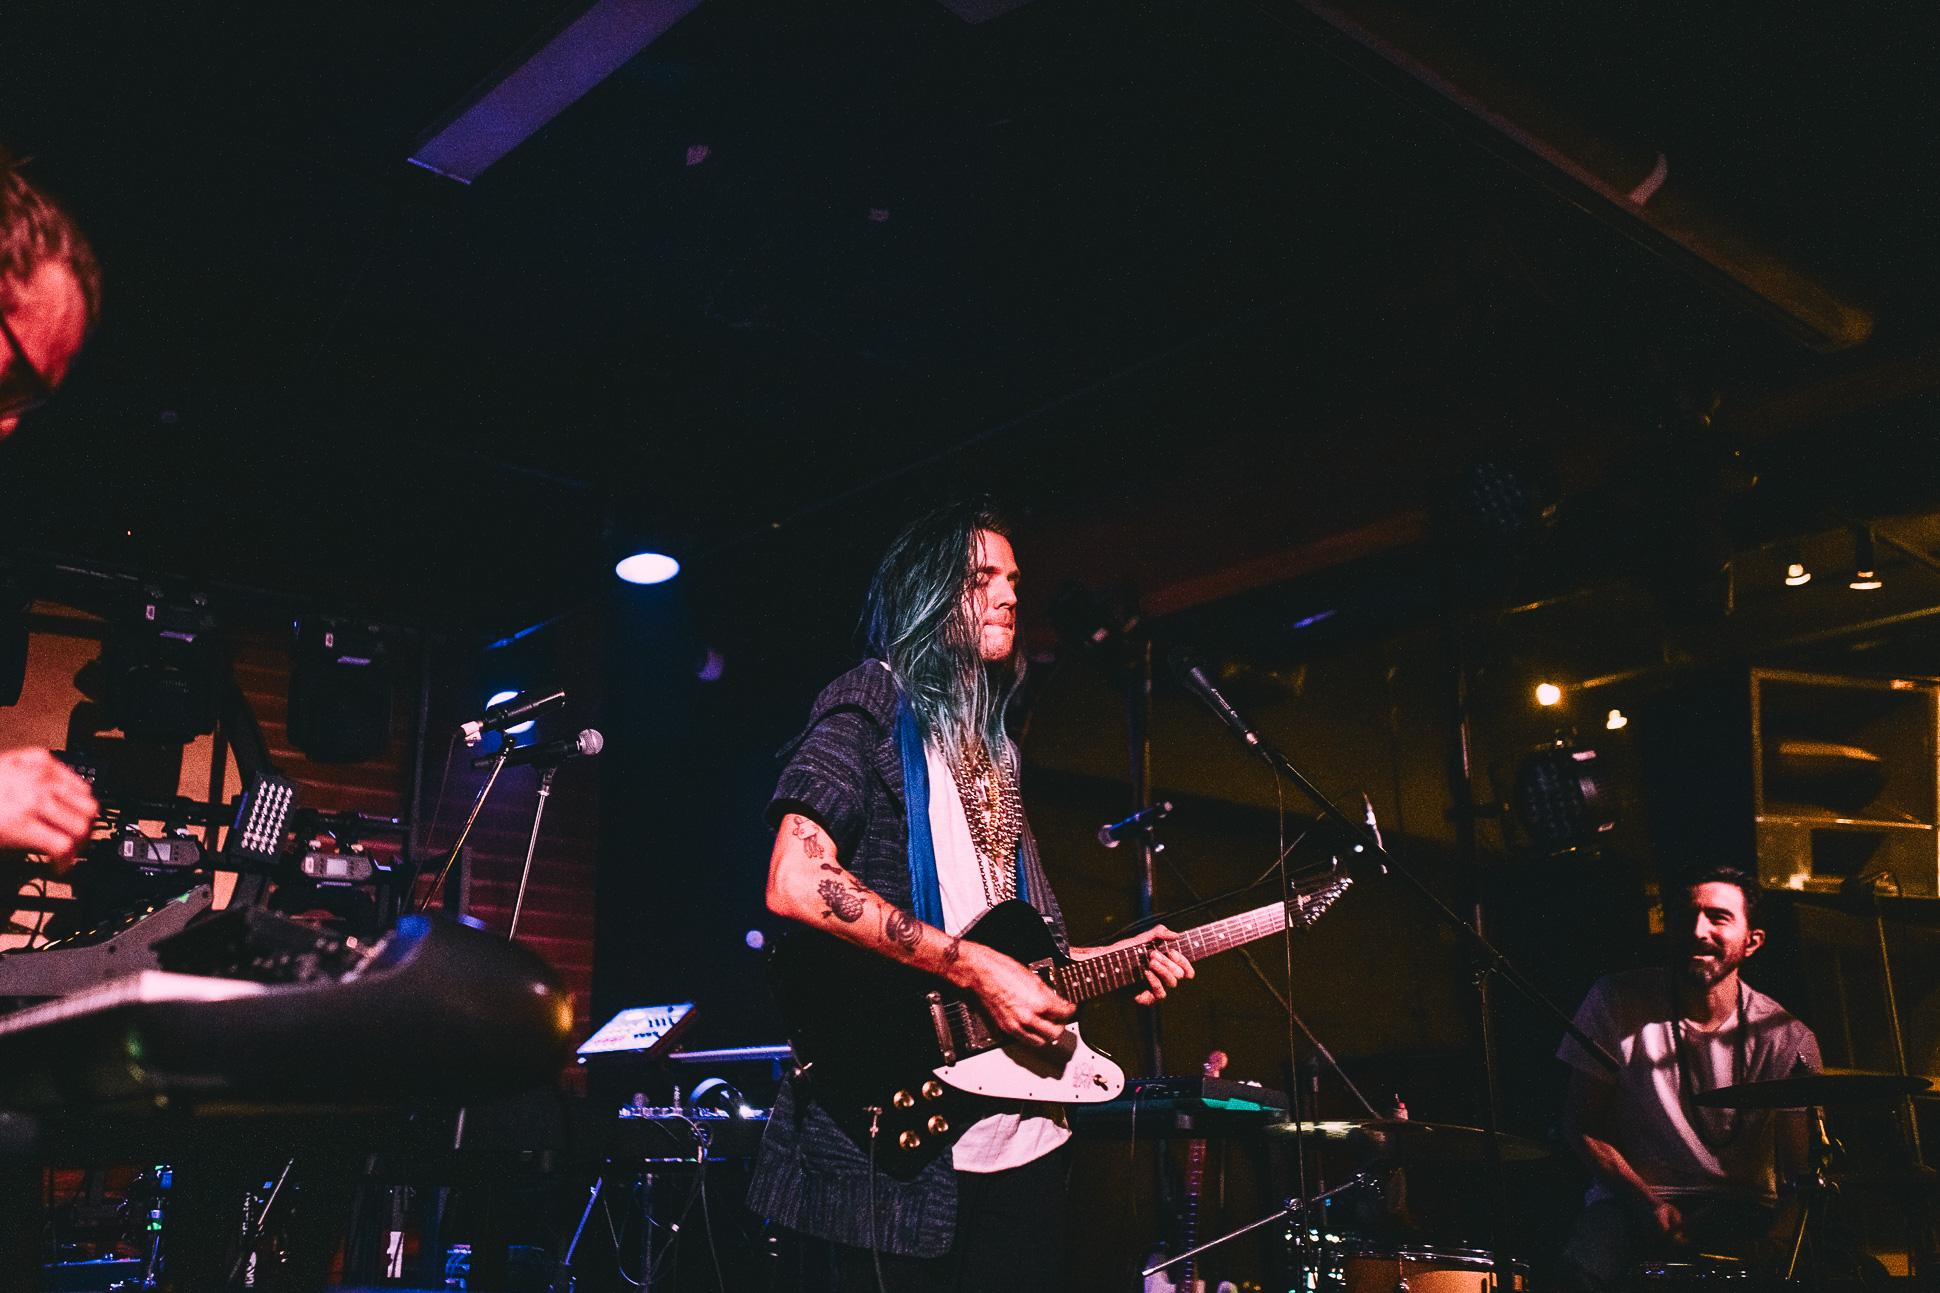 YoungAndSick-FortuneSoundClub-24-01-2019-Vancouver-14.jpg